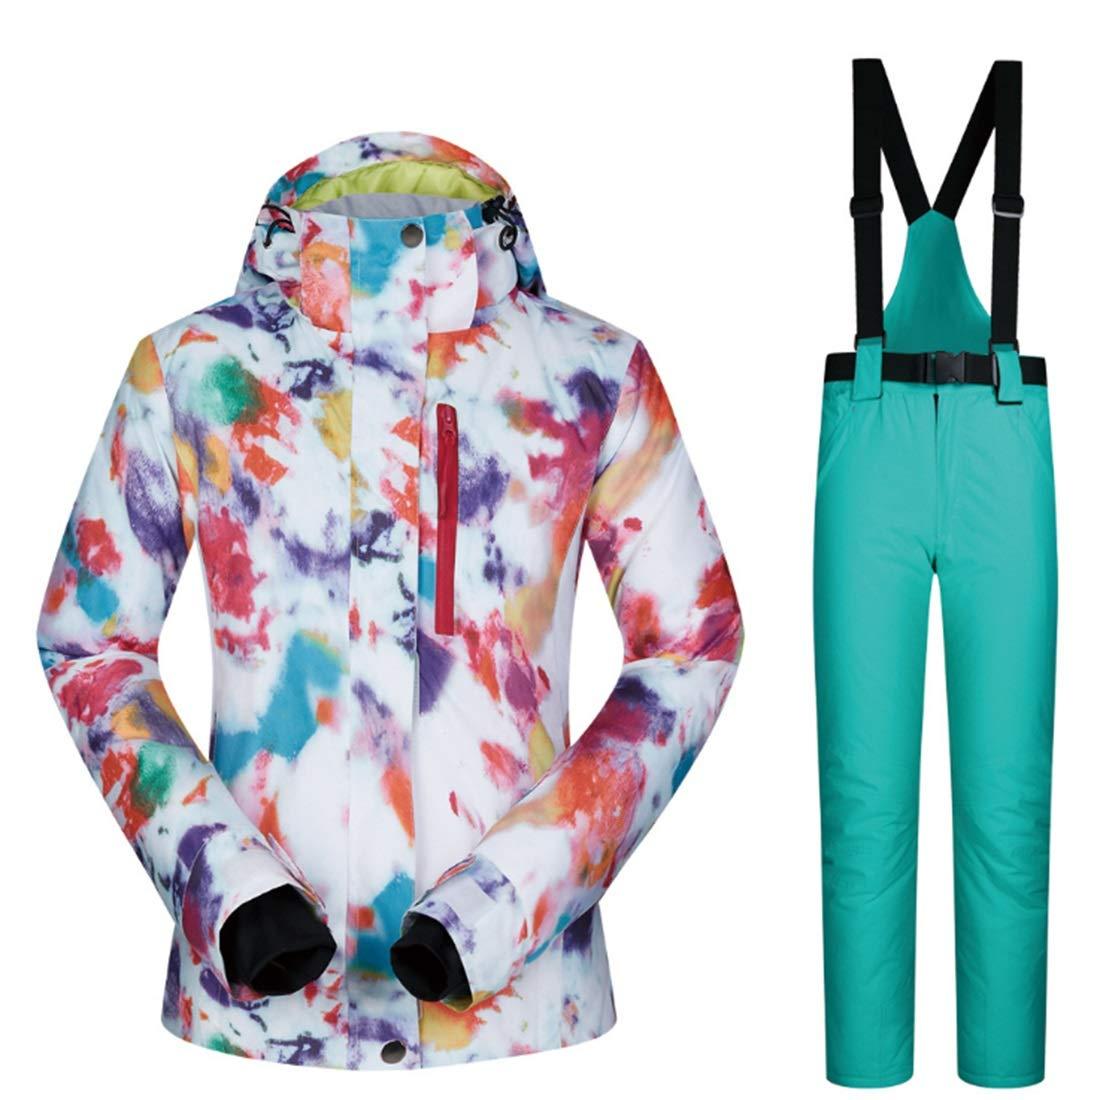 8 XIAMEND Winter Women's Snowsuit Windproof & Waterproof Ski Jacket and Pants Set (color   07, Size   M)